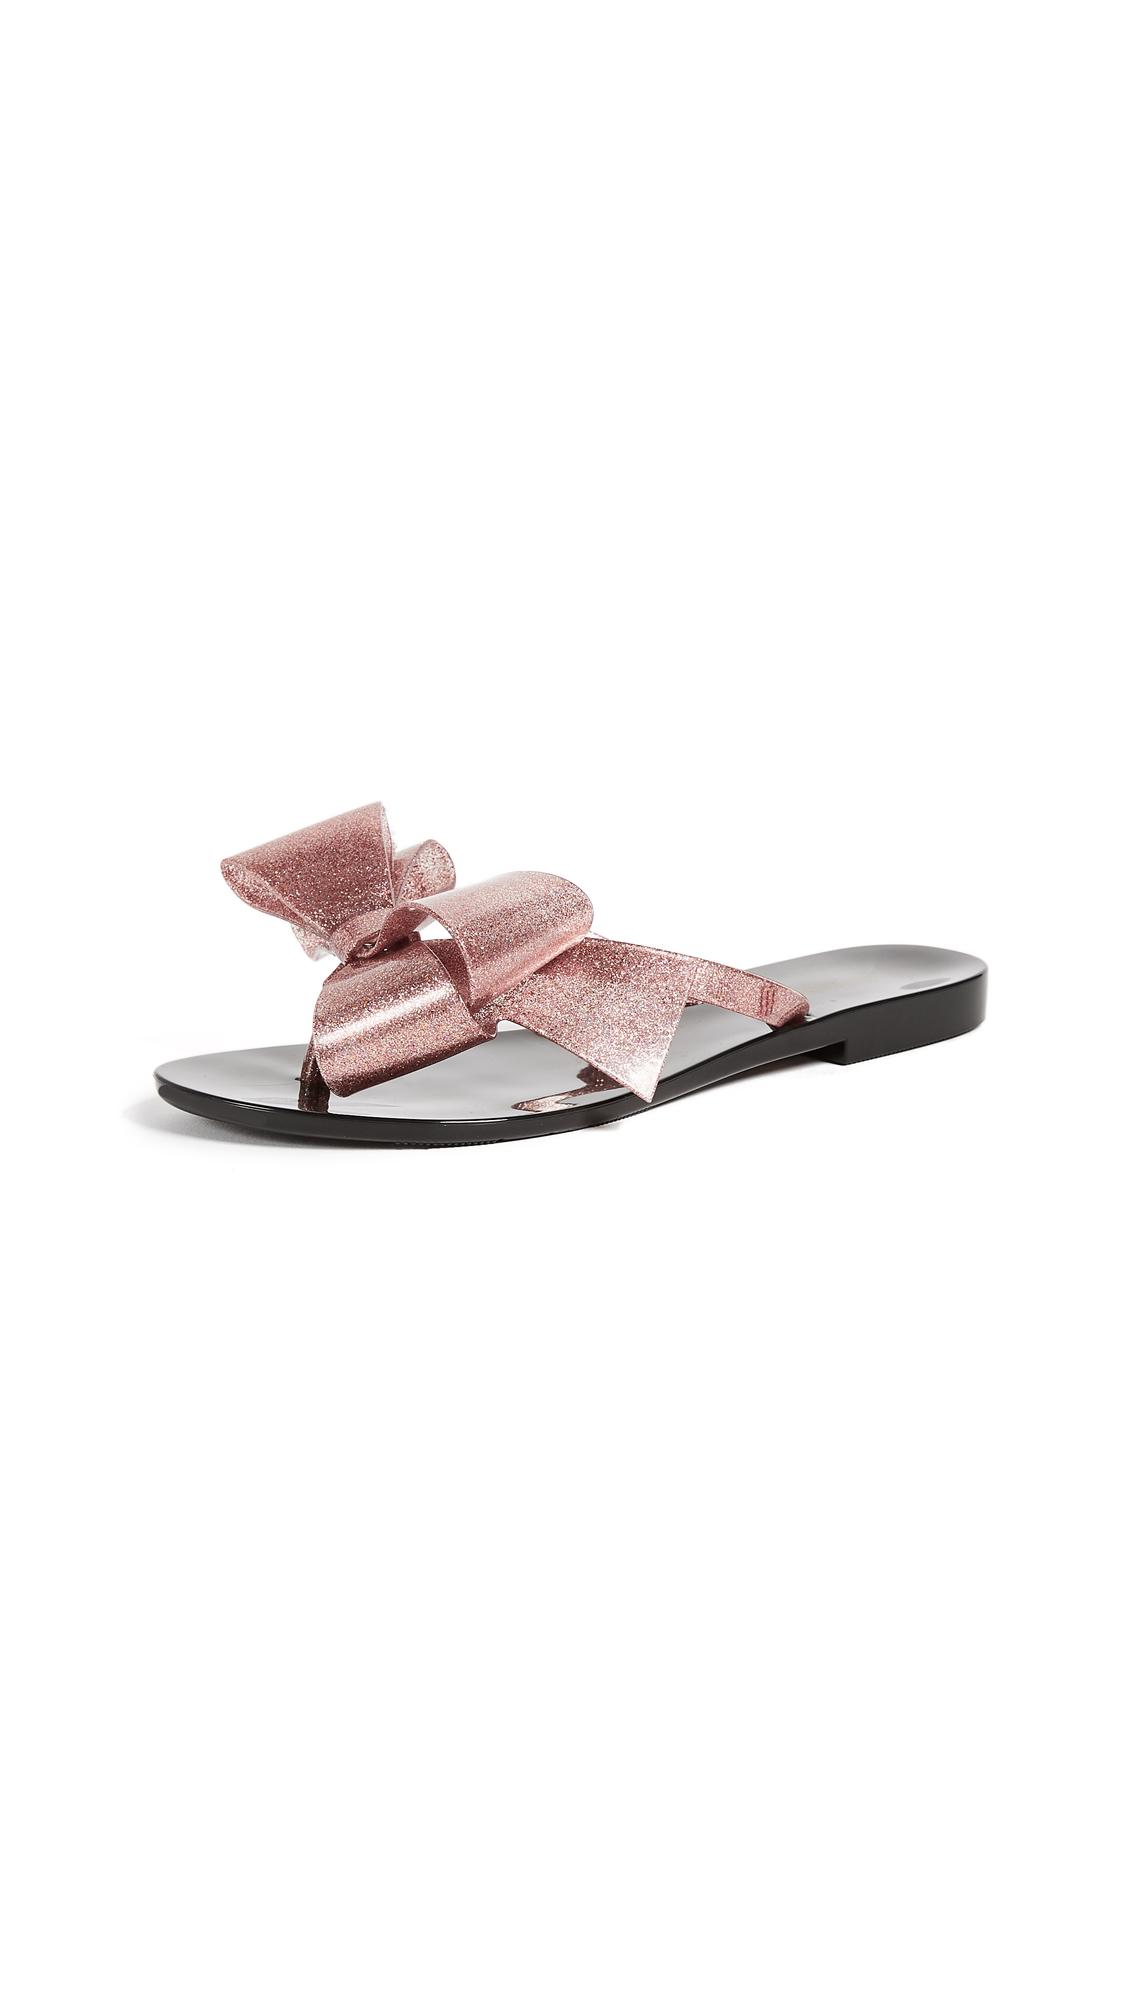 Melissa Harmonic Bow Thong Sandals - Black Rose Glitter